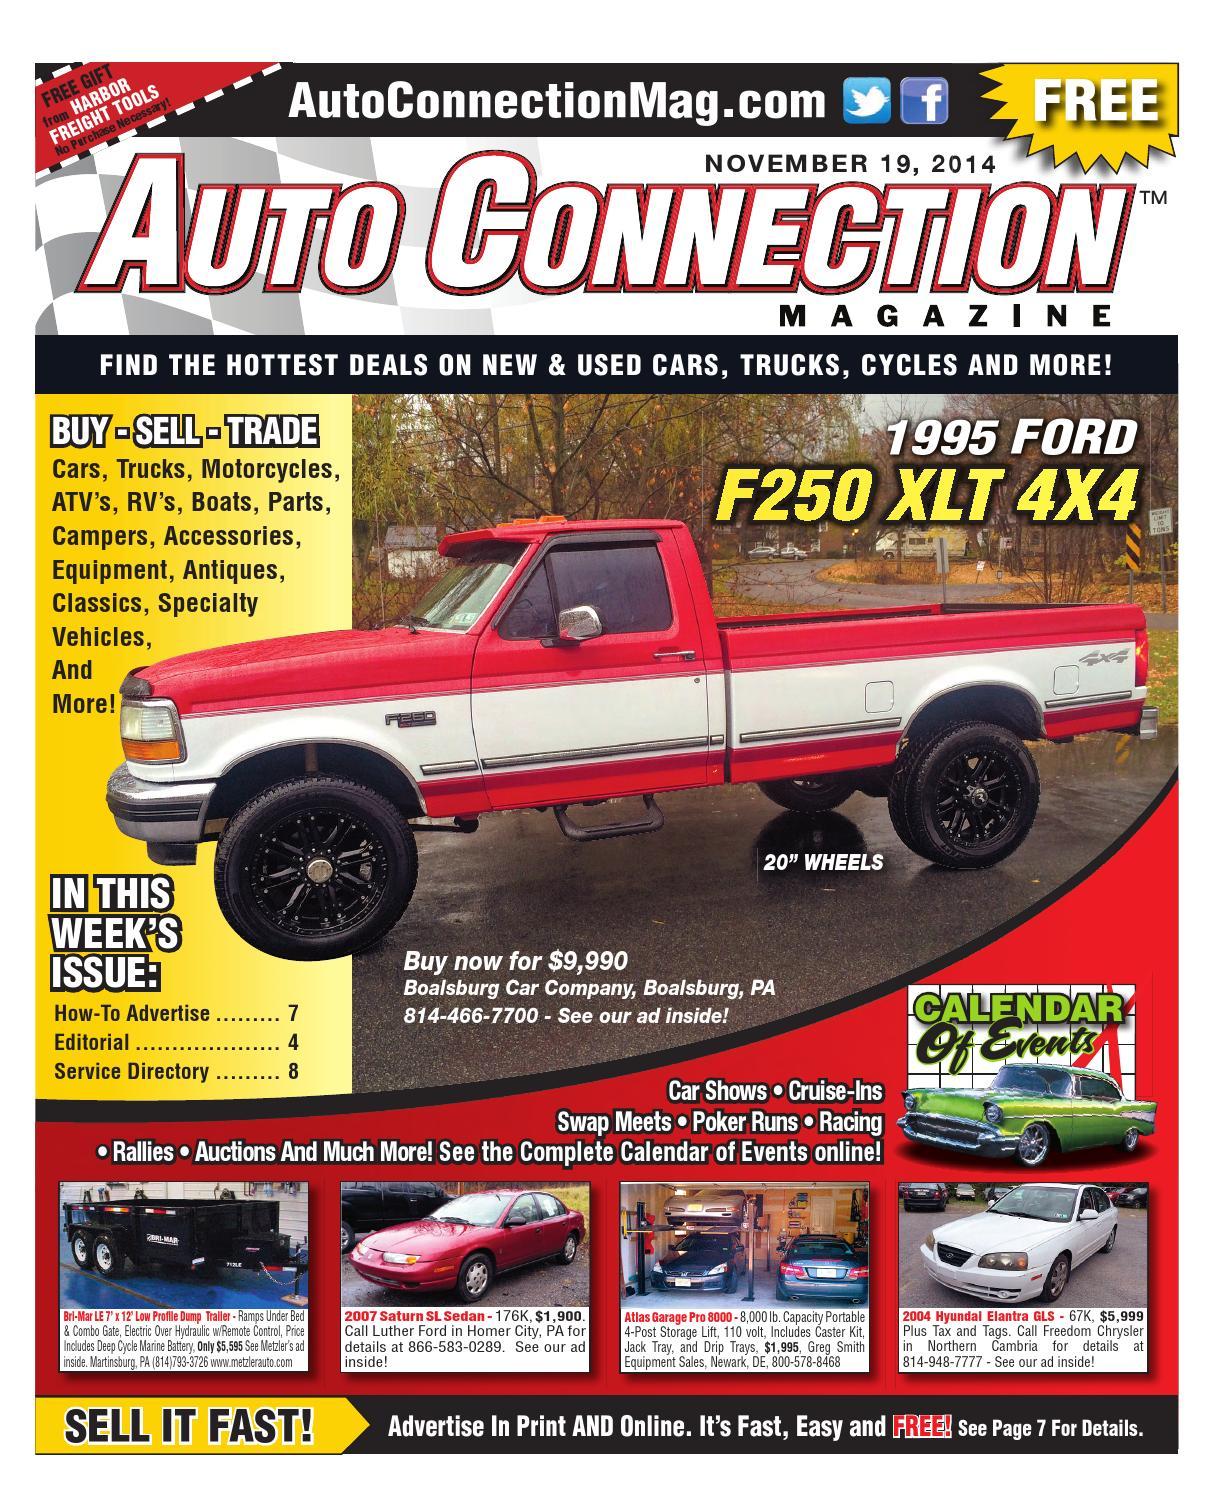 New 12 Volt 150 Amp Alternator Fits 2011-2014 Ford Mustang 5.0L V8 GL-999